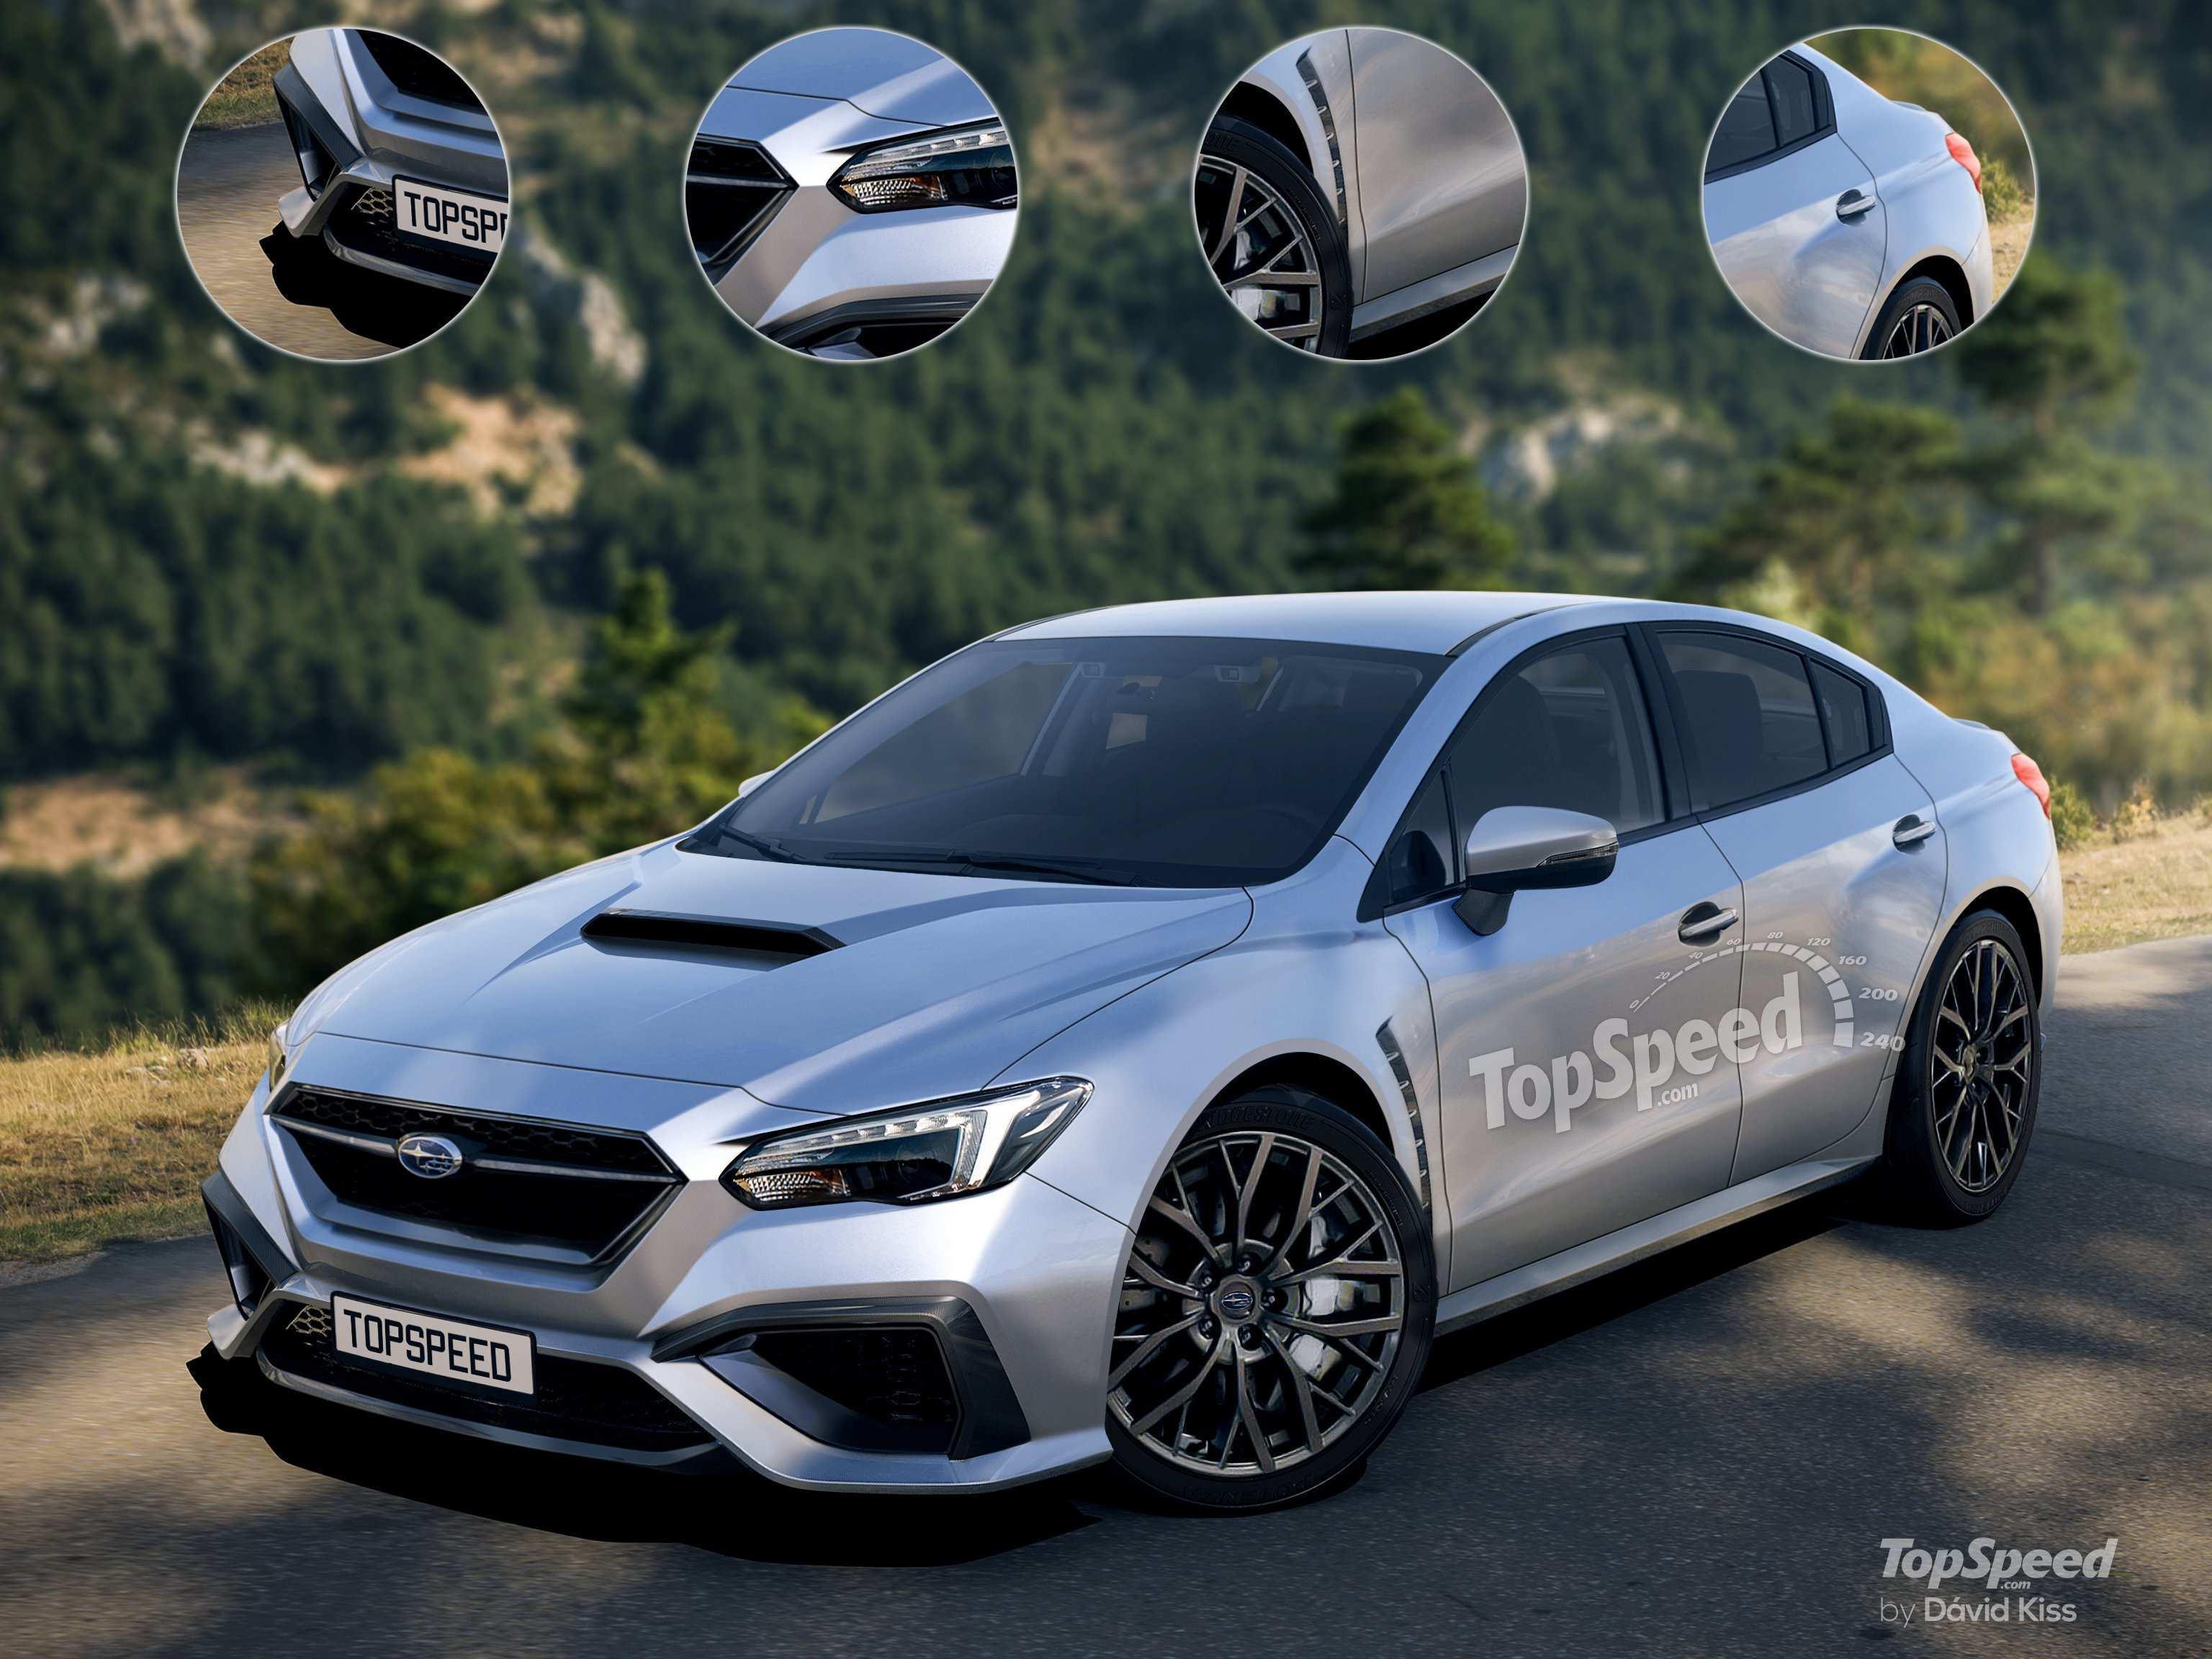 48 Gallery of 2020 Subaru Legacy Redesign Spesification by 2020 Subaru Legacy Redesign